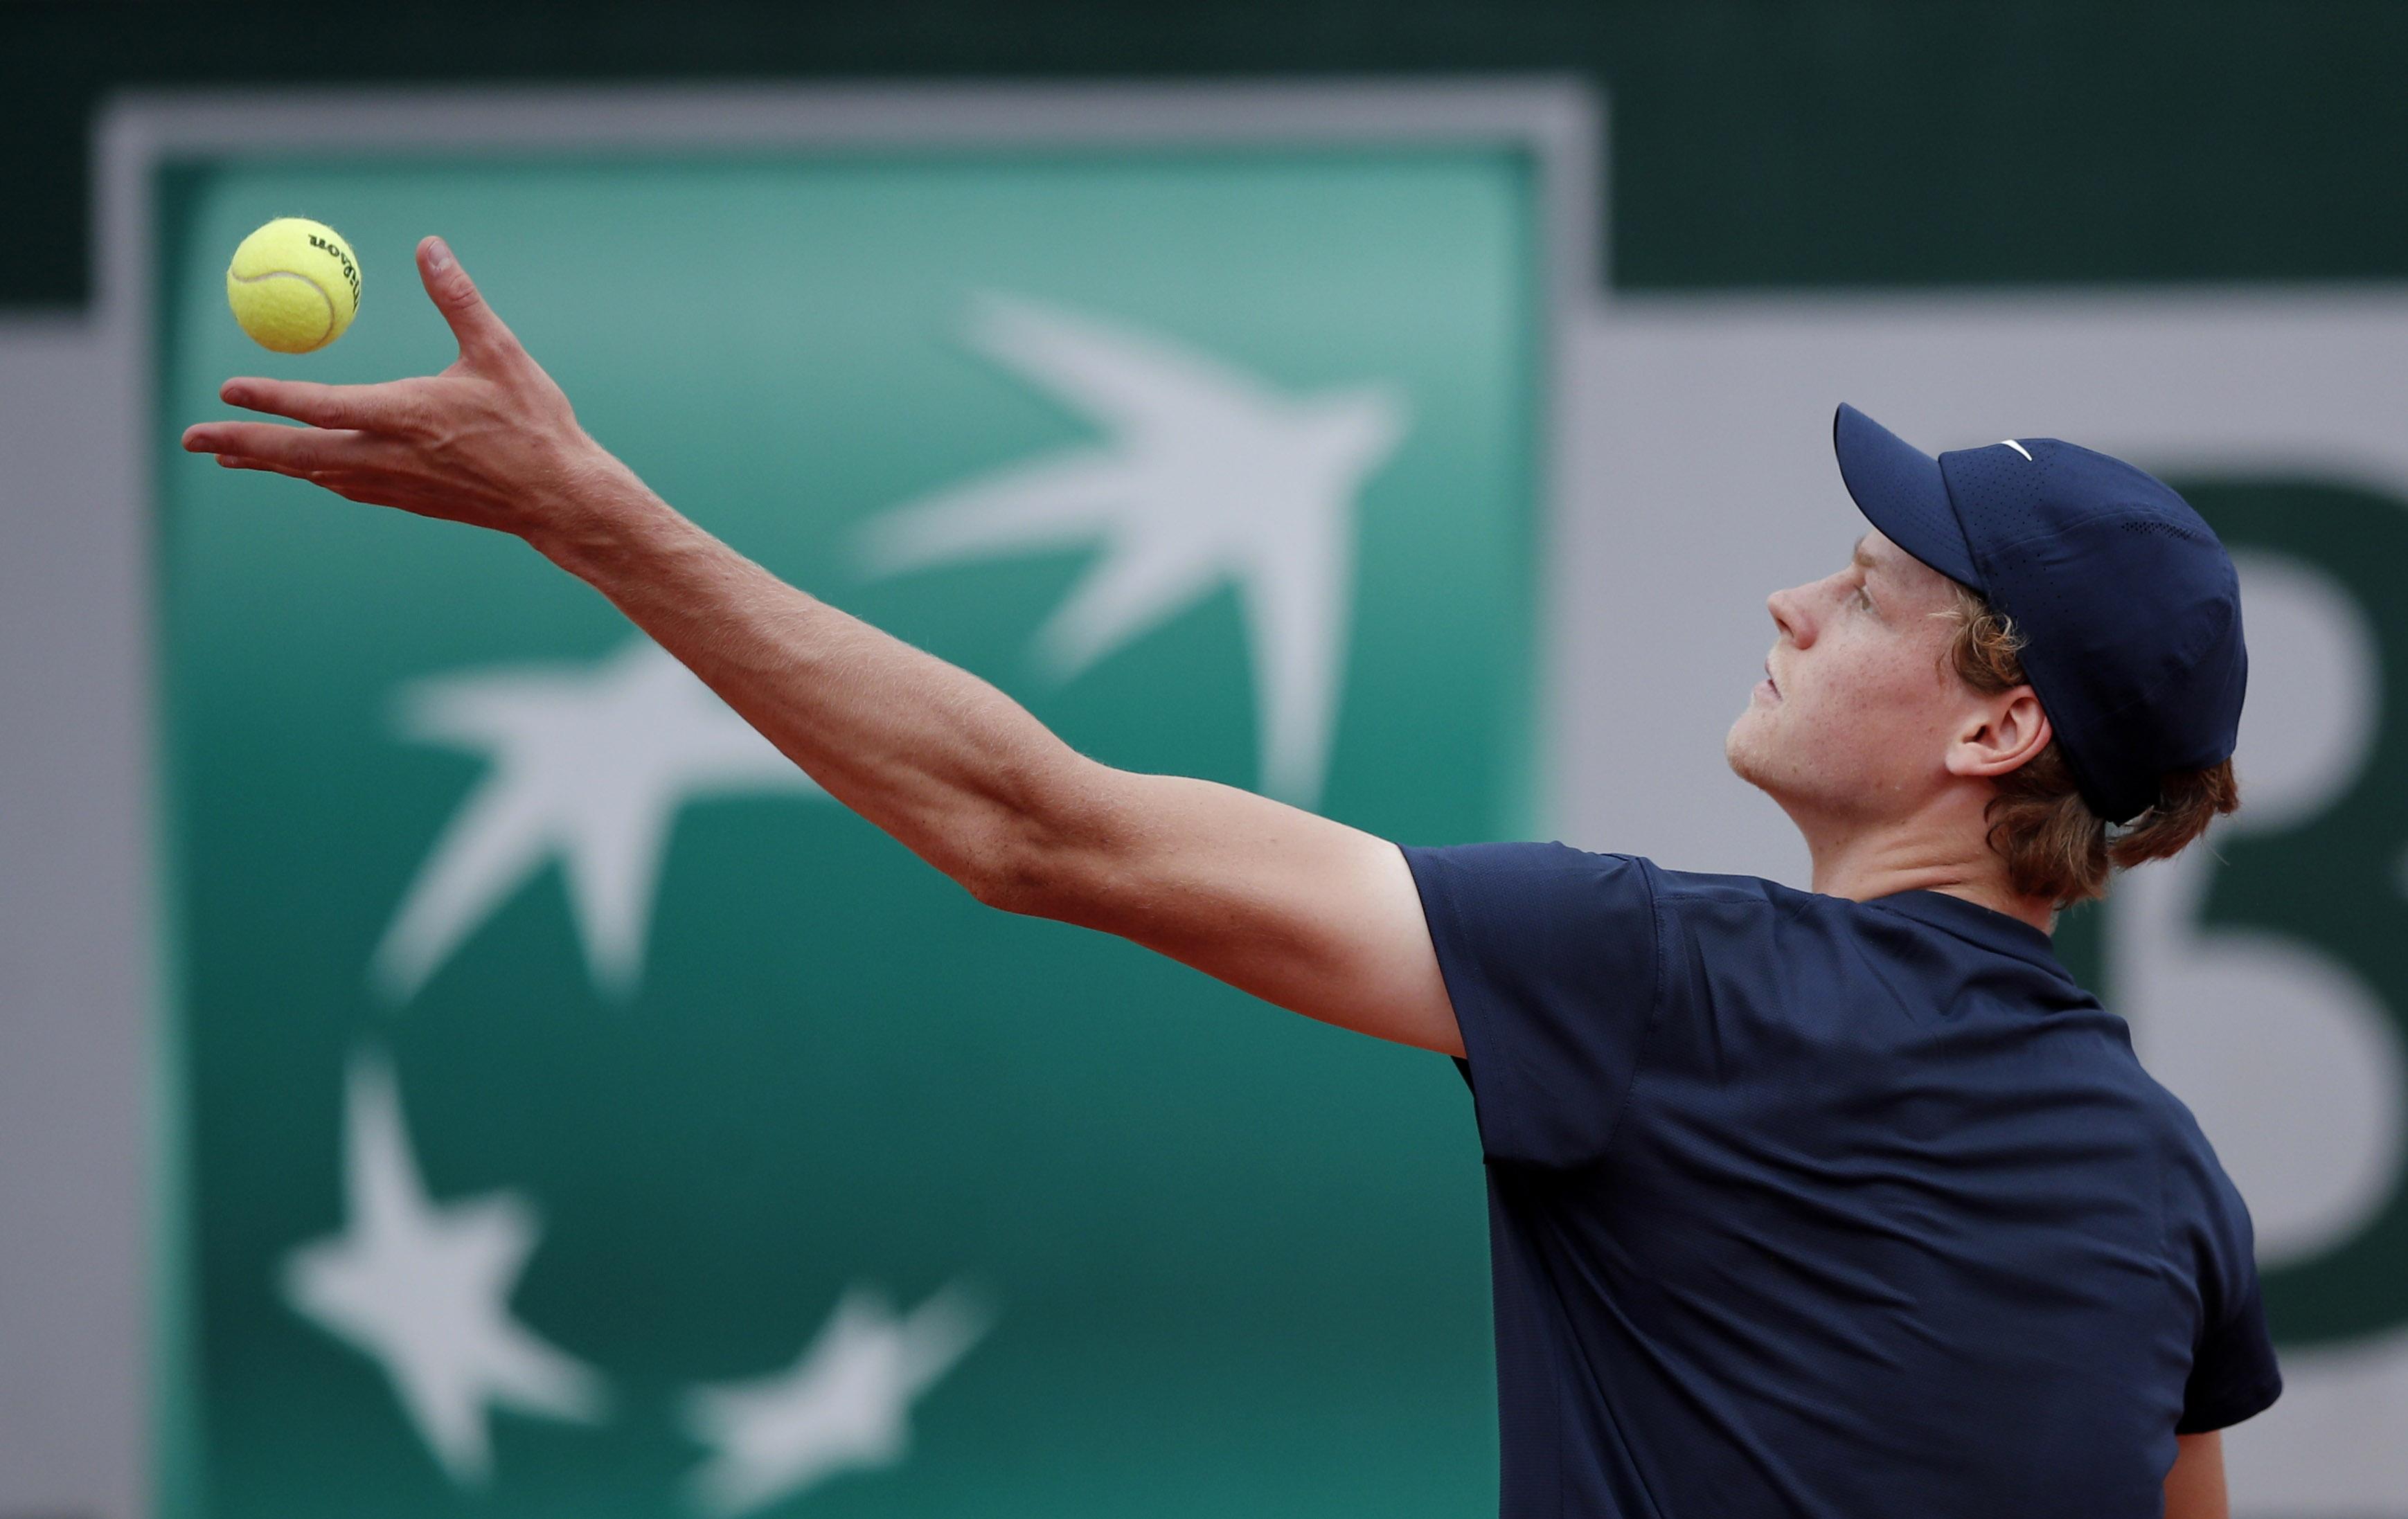 Tennis - French Open - Roland Garros, Paris, France - June 5, 2021 Italy's Jannik Sinner in action during his third round match against Sweden's Mikael Ymer REUTERS/Benoit Tessier